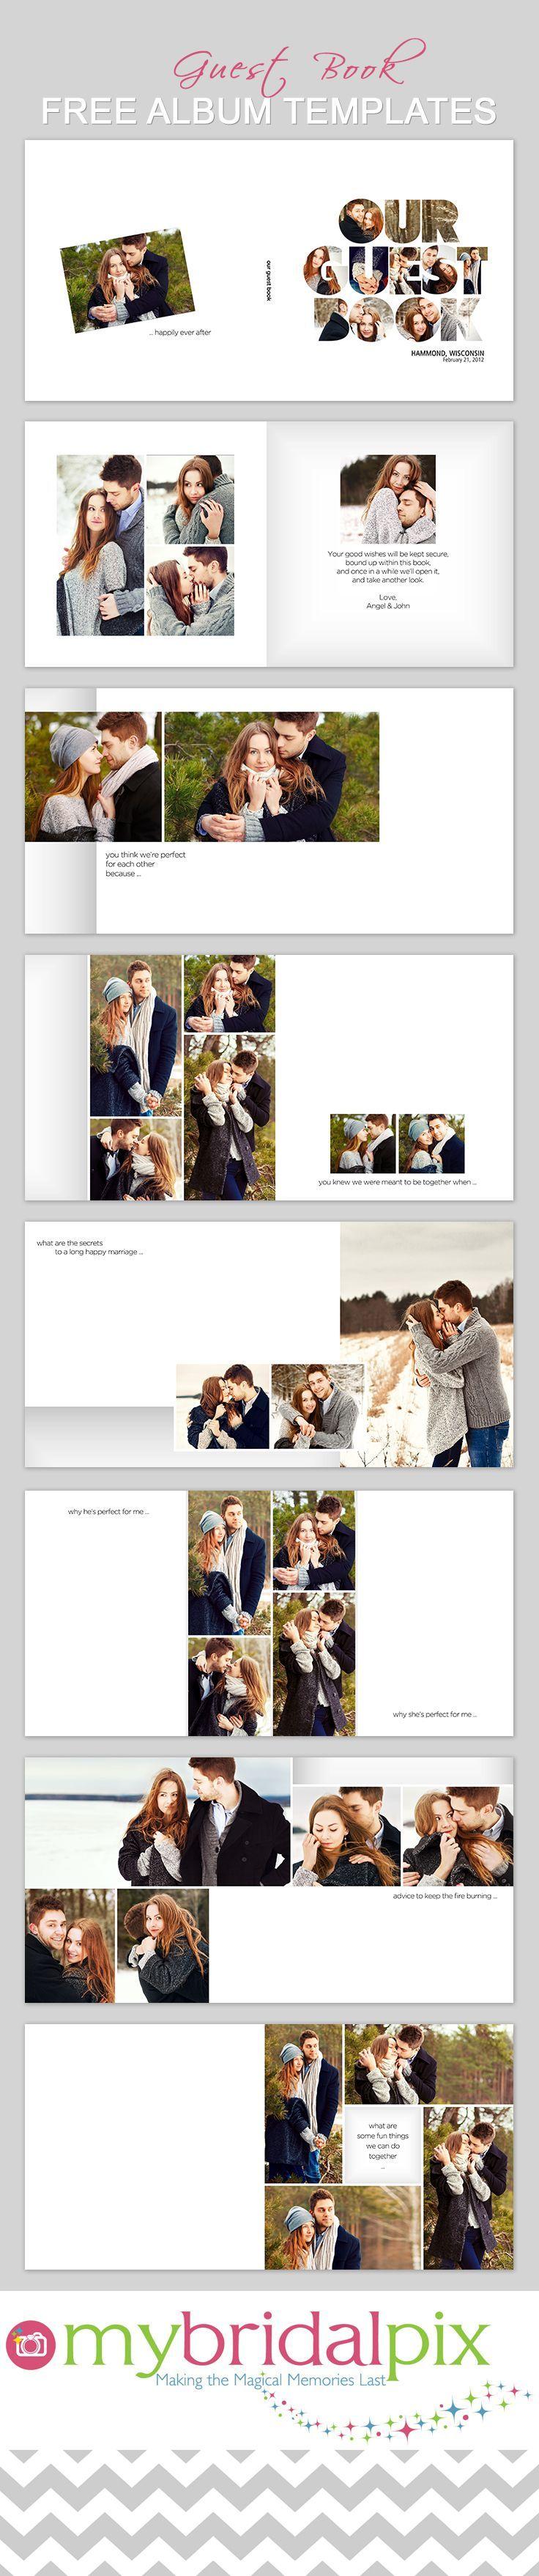 15 best Album Templates images on Pinterest   Wedding pics, Wedding ...